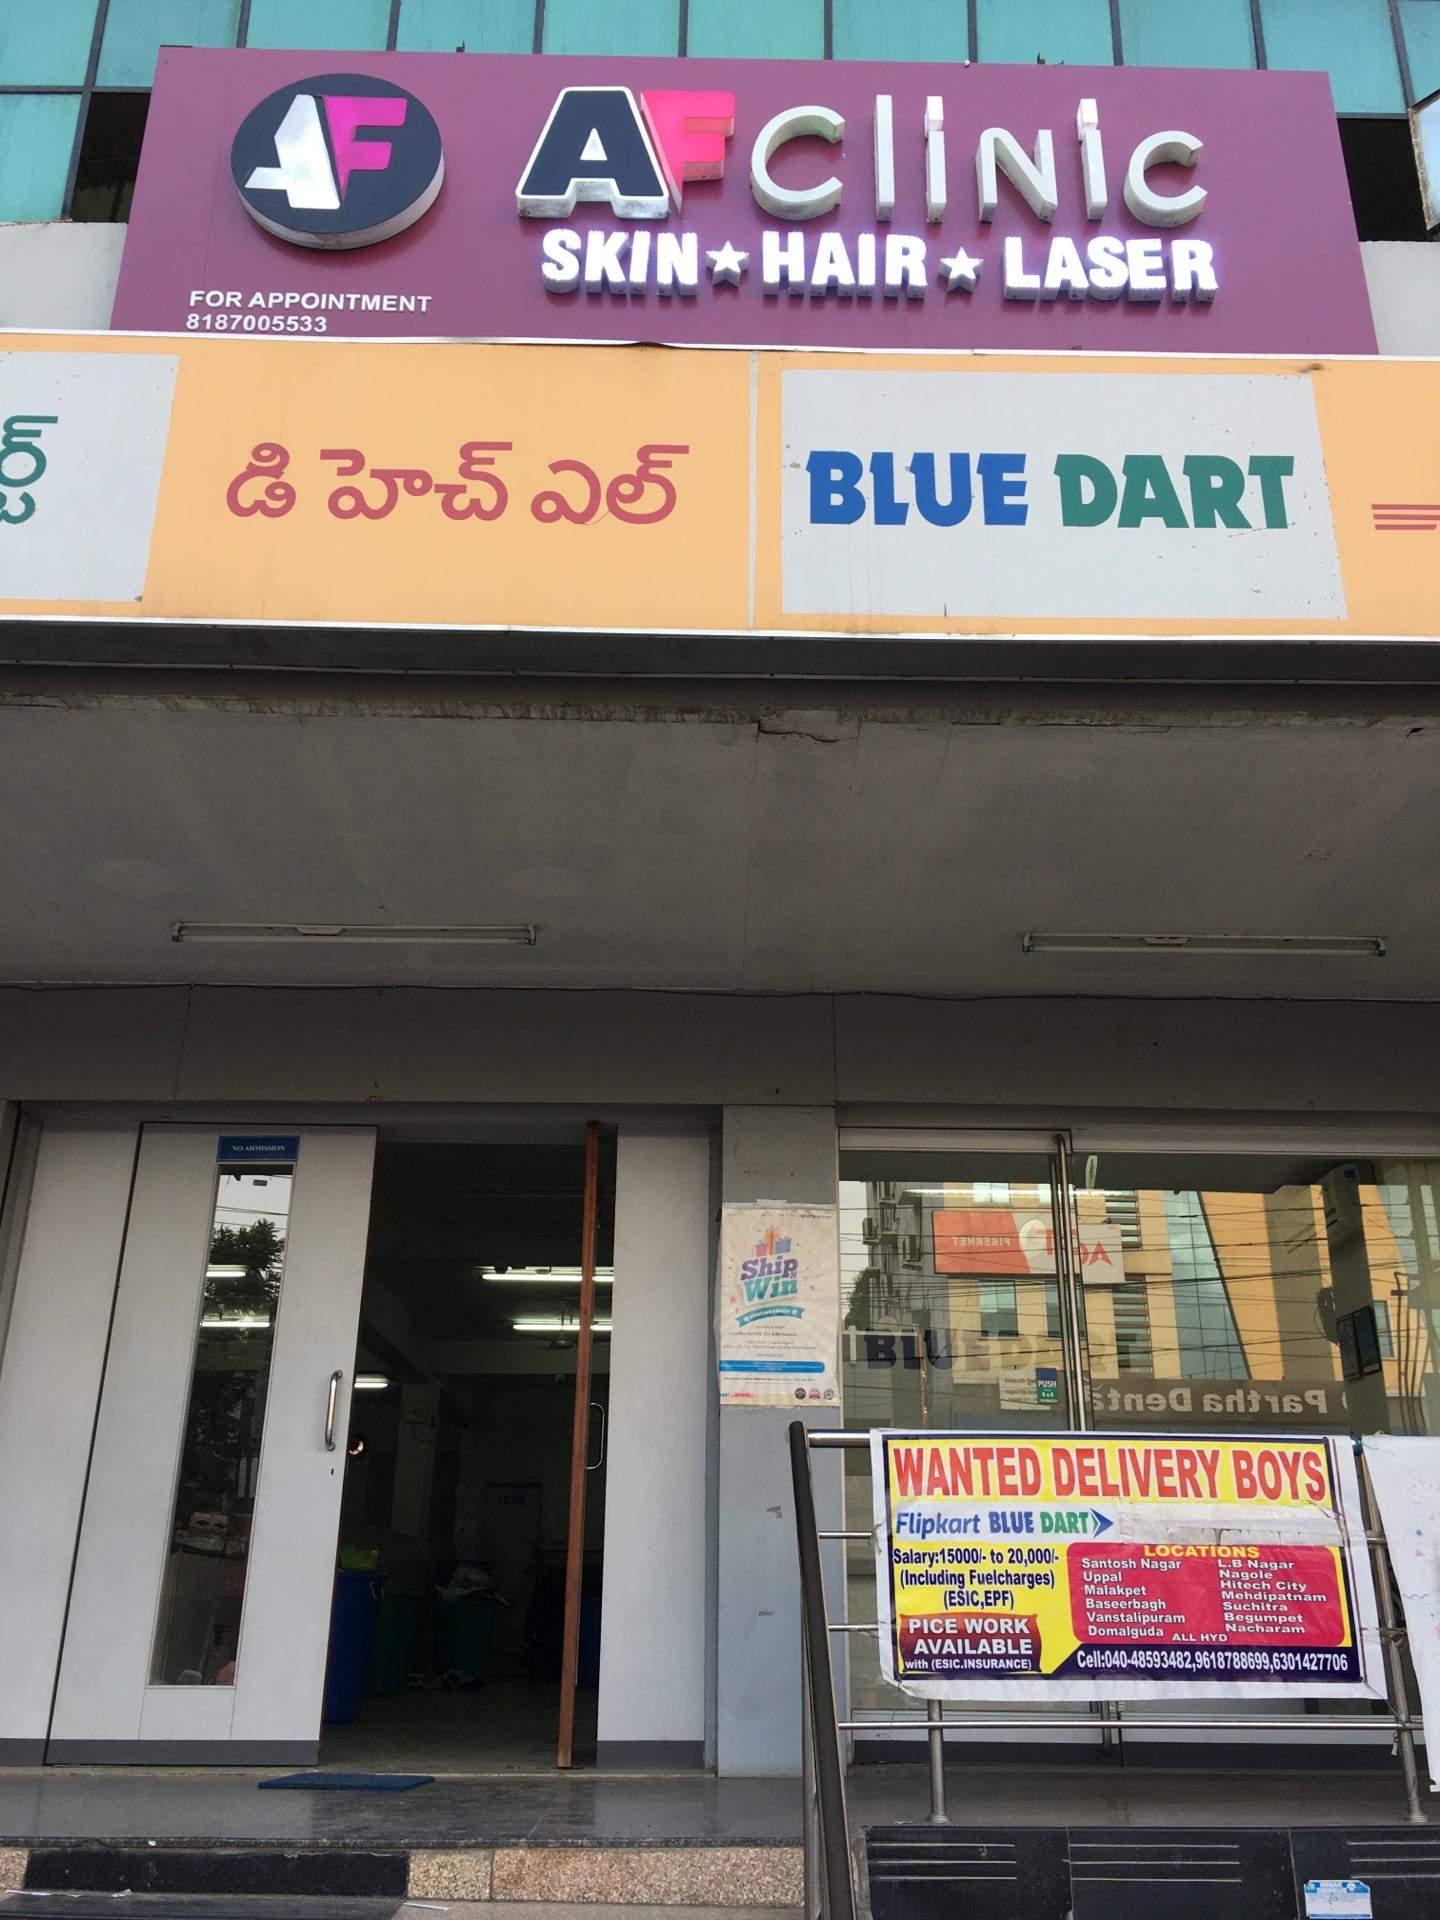 Top 30 Skin Care Clinics in Mehdipatnam, Hyderabad - Best